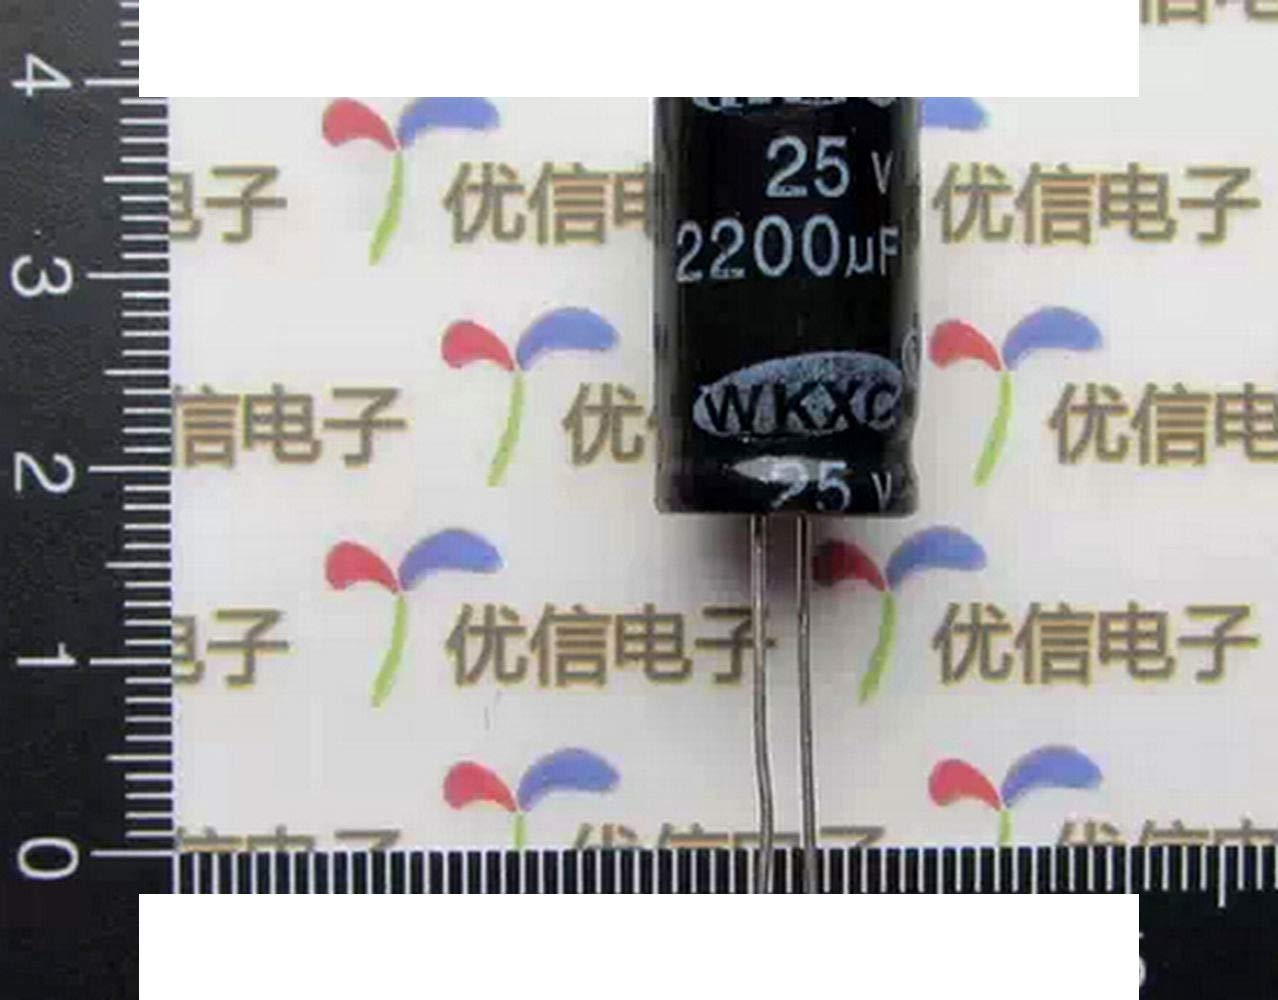 DIYElectronic 10 pcs Electrolytic Capacitors 2200UF 25V 13X21MM DIY Electronic Component Aluminum Electrolytic Capacitor